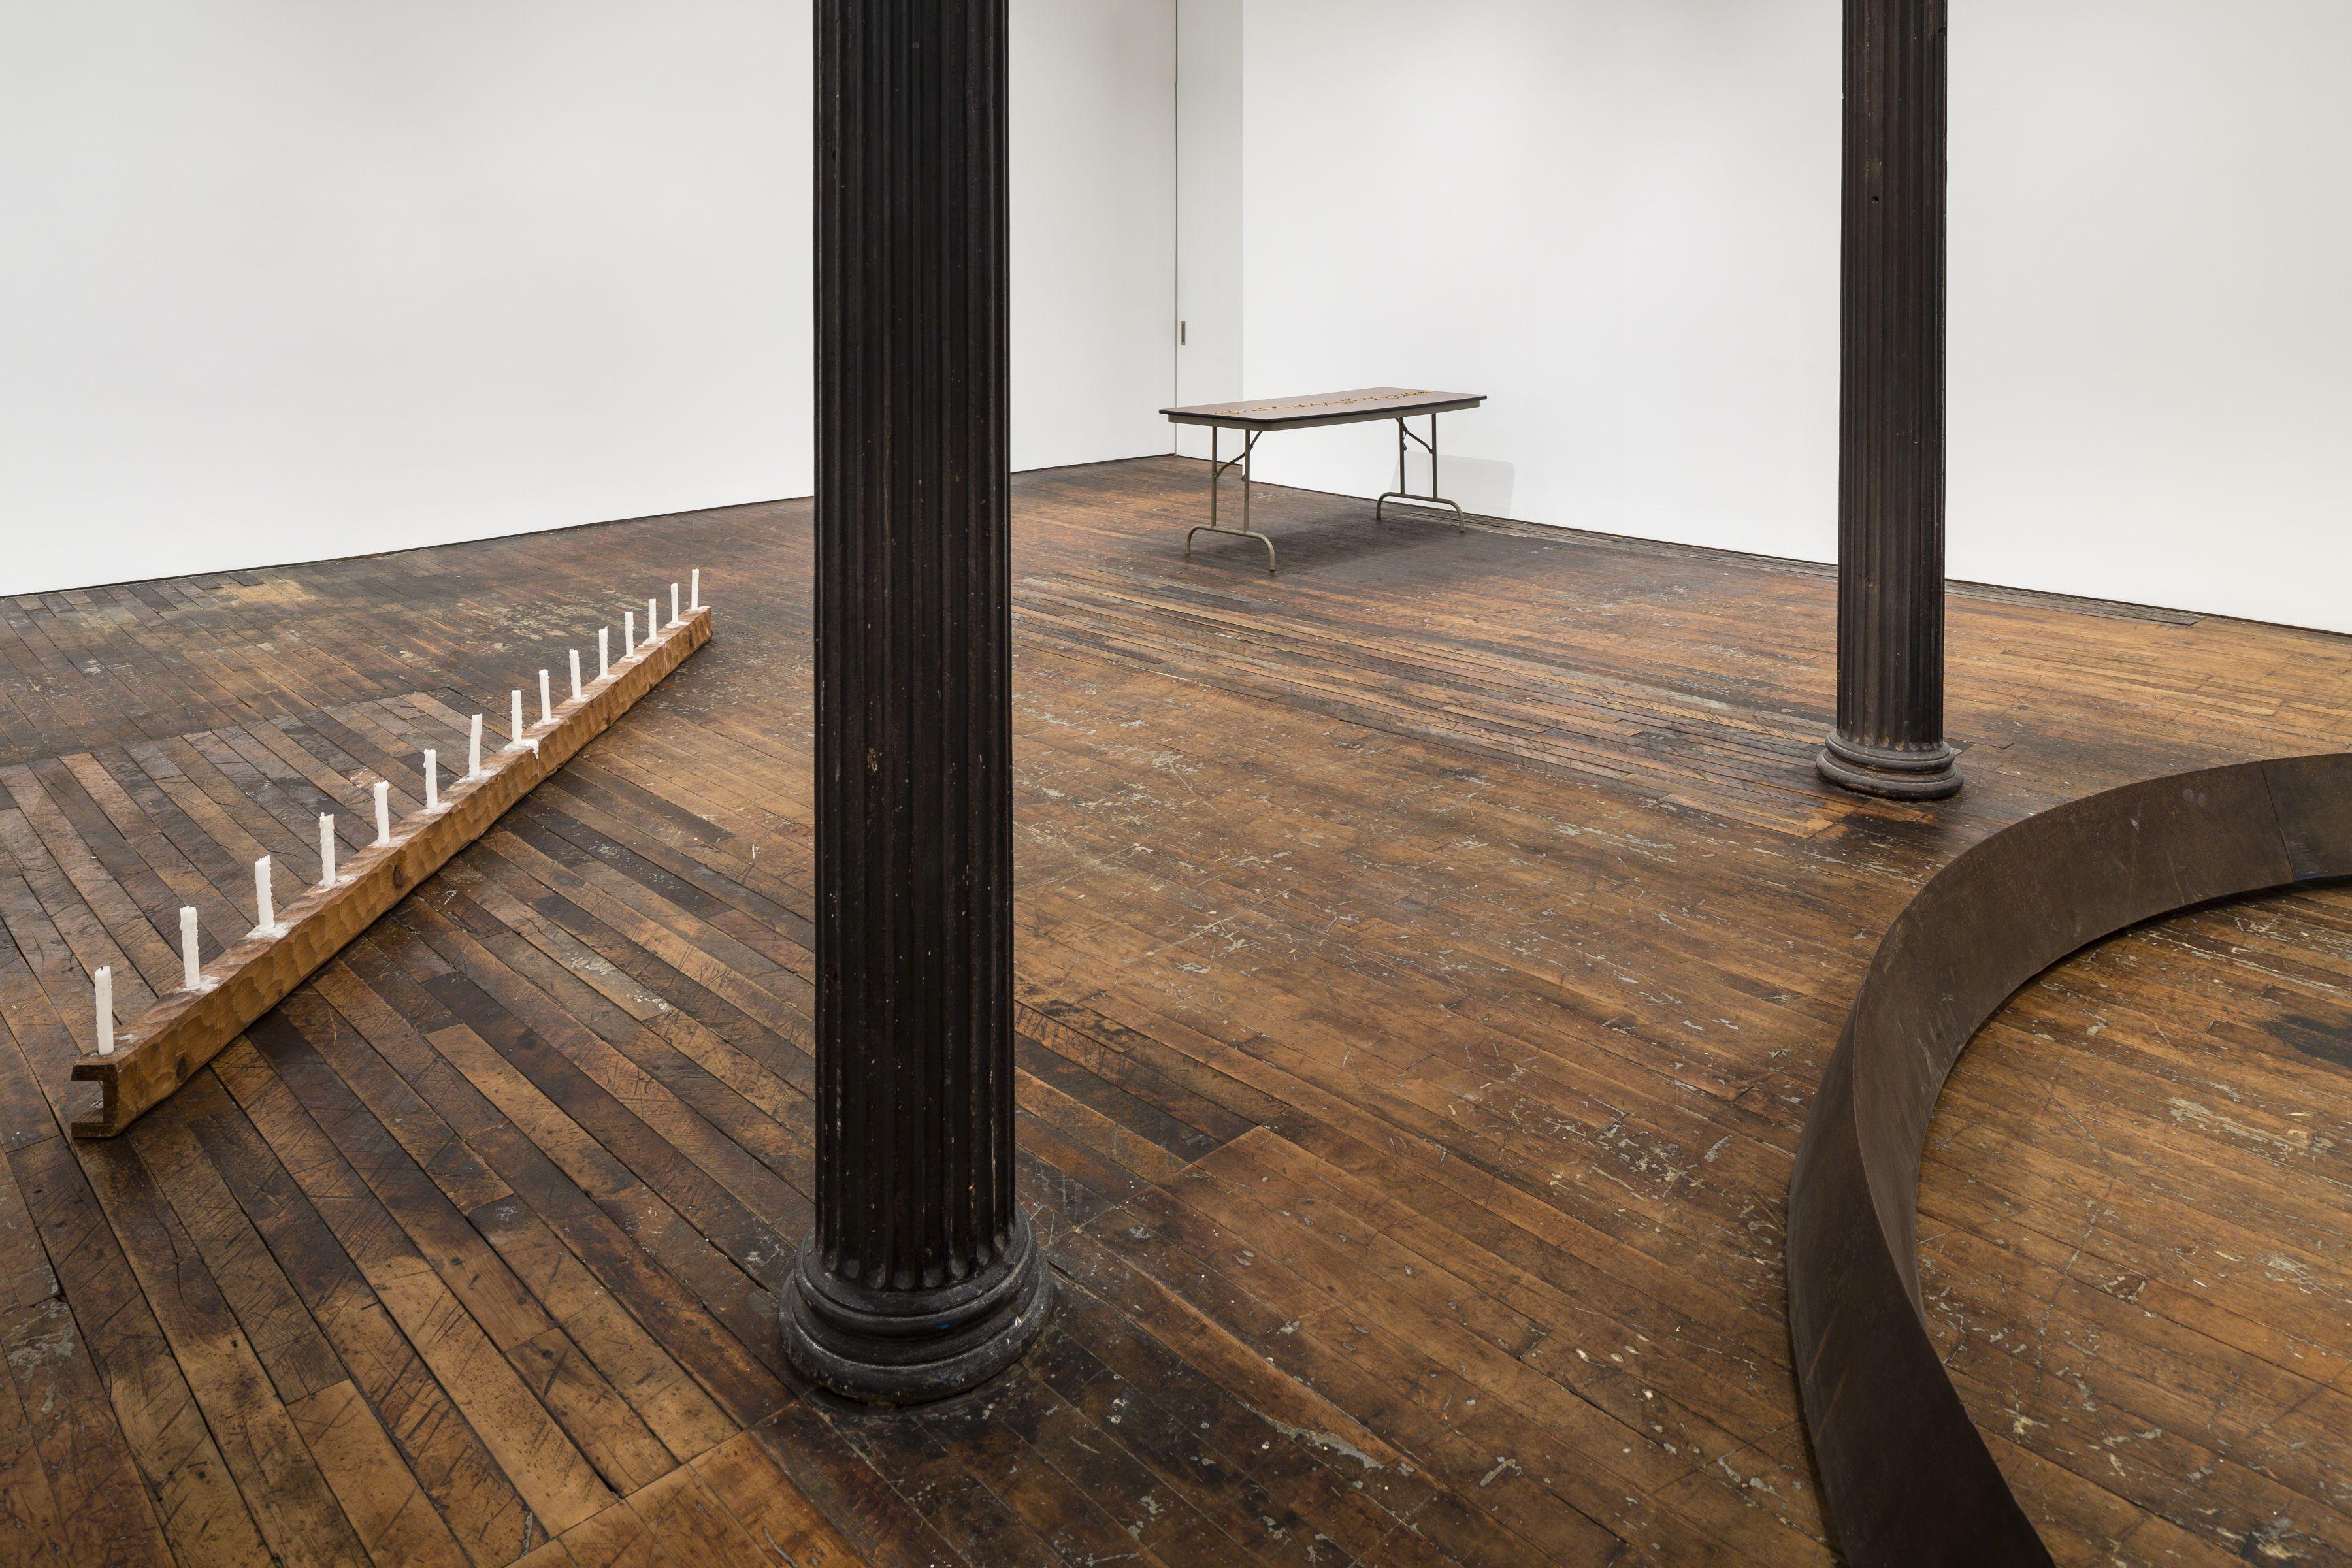 Untitled: Benassi, Bochner, Cabrita Reis, Gober, Nauman, Serra, Sosnowska, Tuttle, Walther– installation view 11